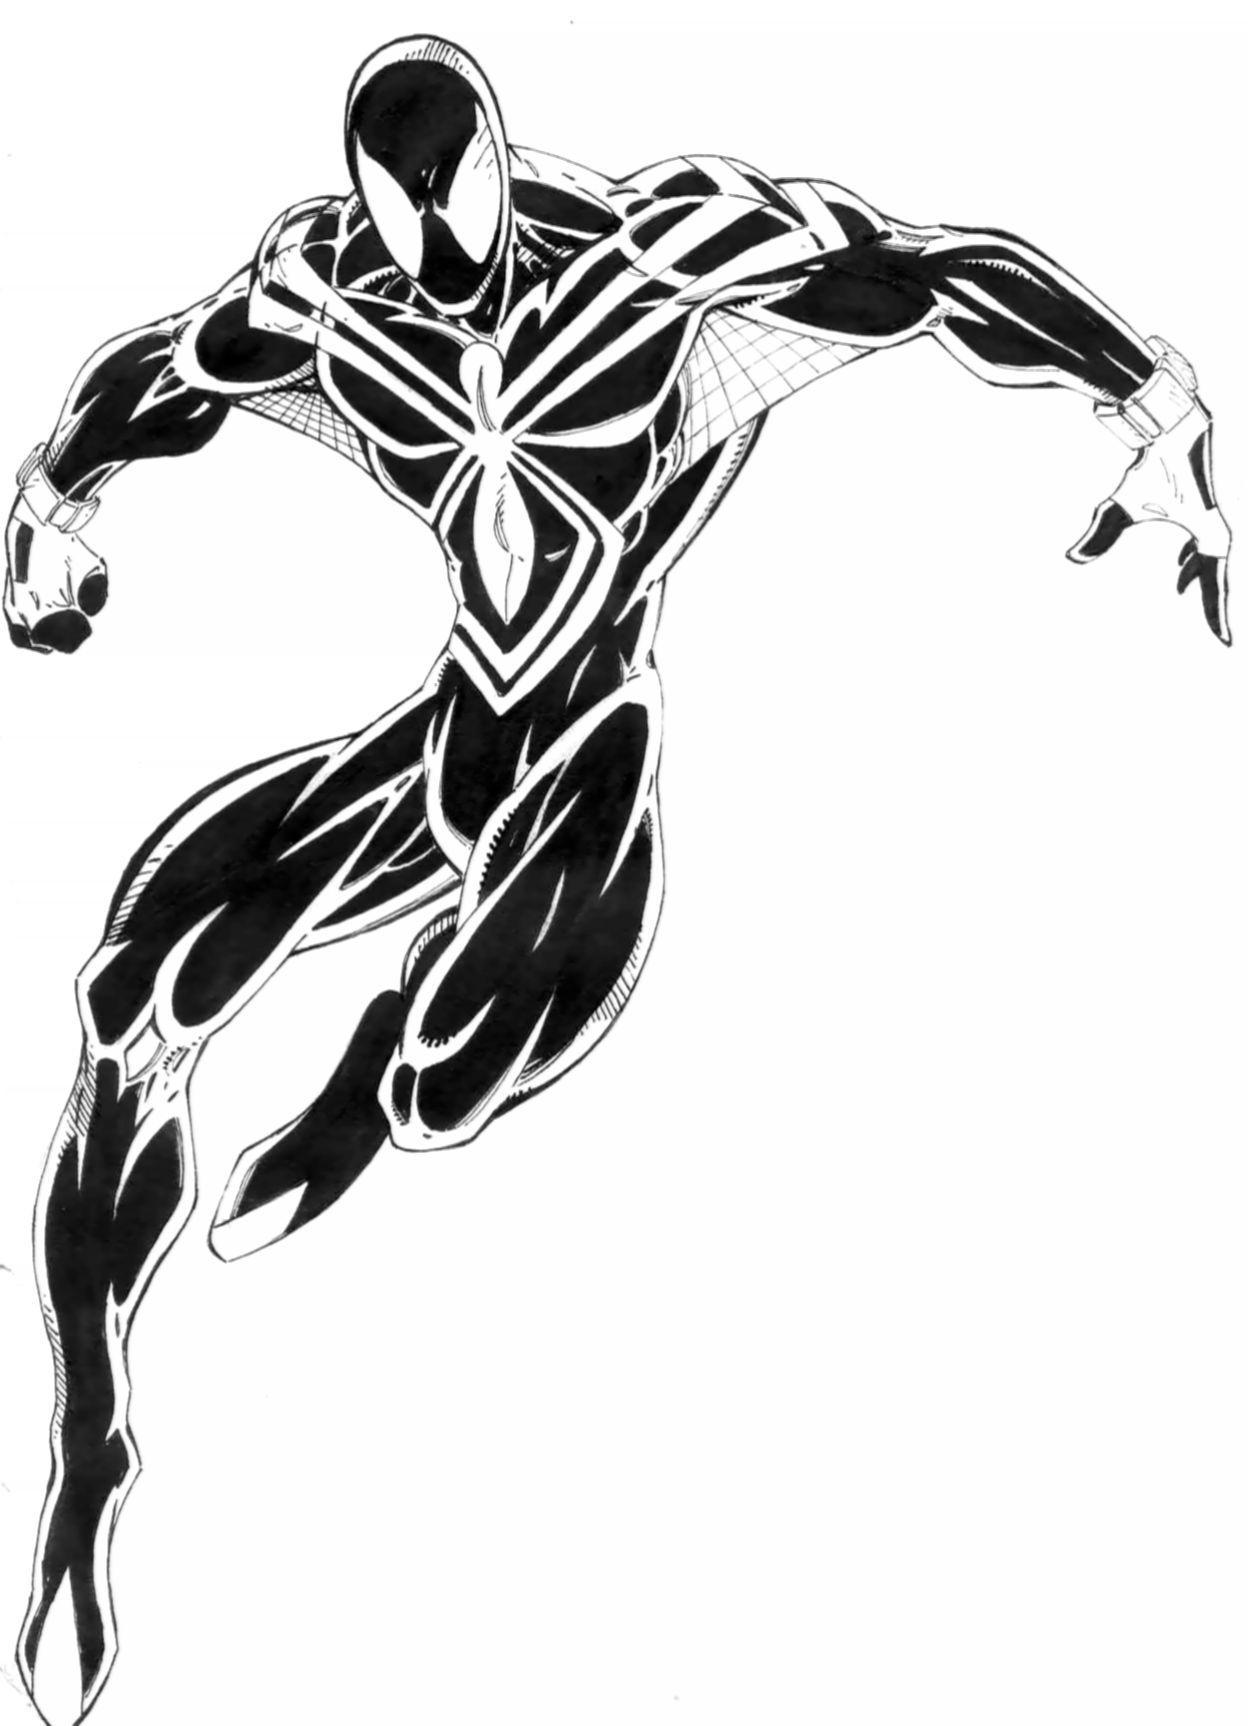 SPIDERMAN-BLACK DESIGN-1 by THEHITMANHORTON on DeviantArt